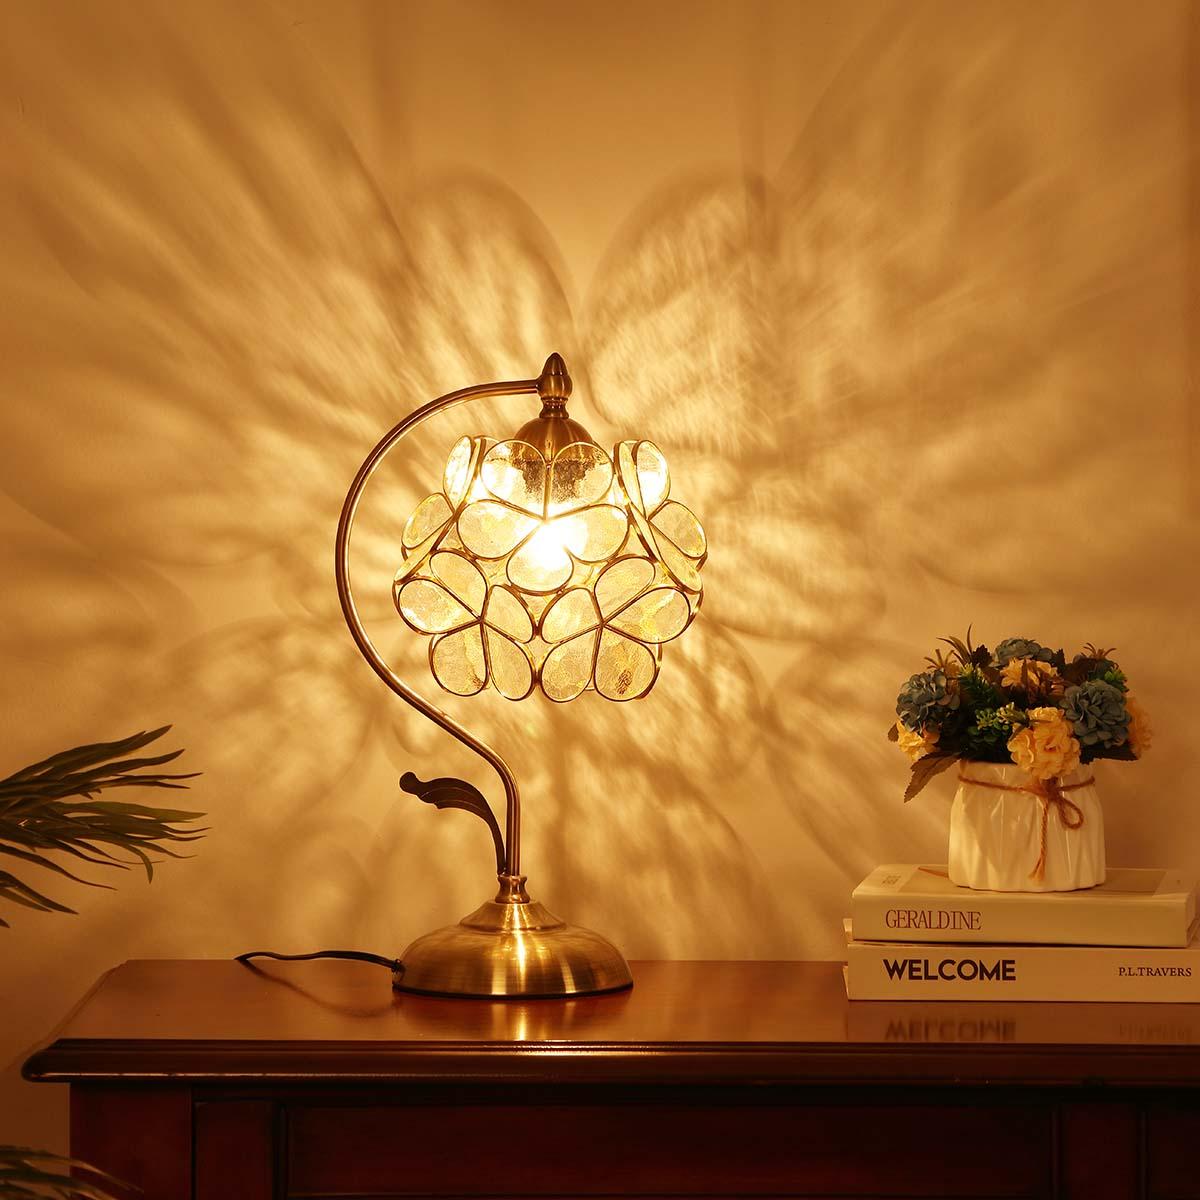 Bieye Lighting L20734 Tiffany Lamp